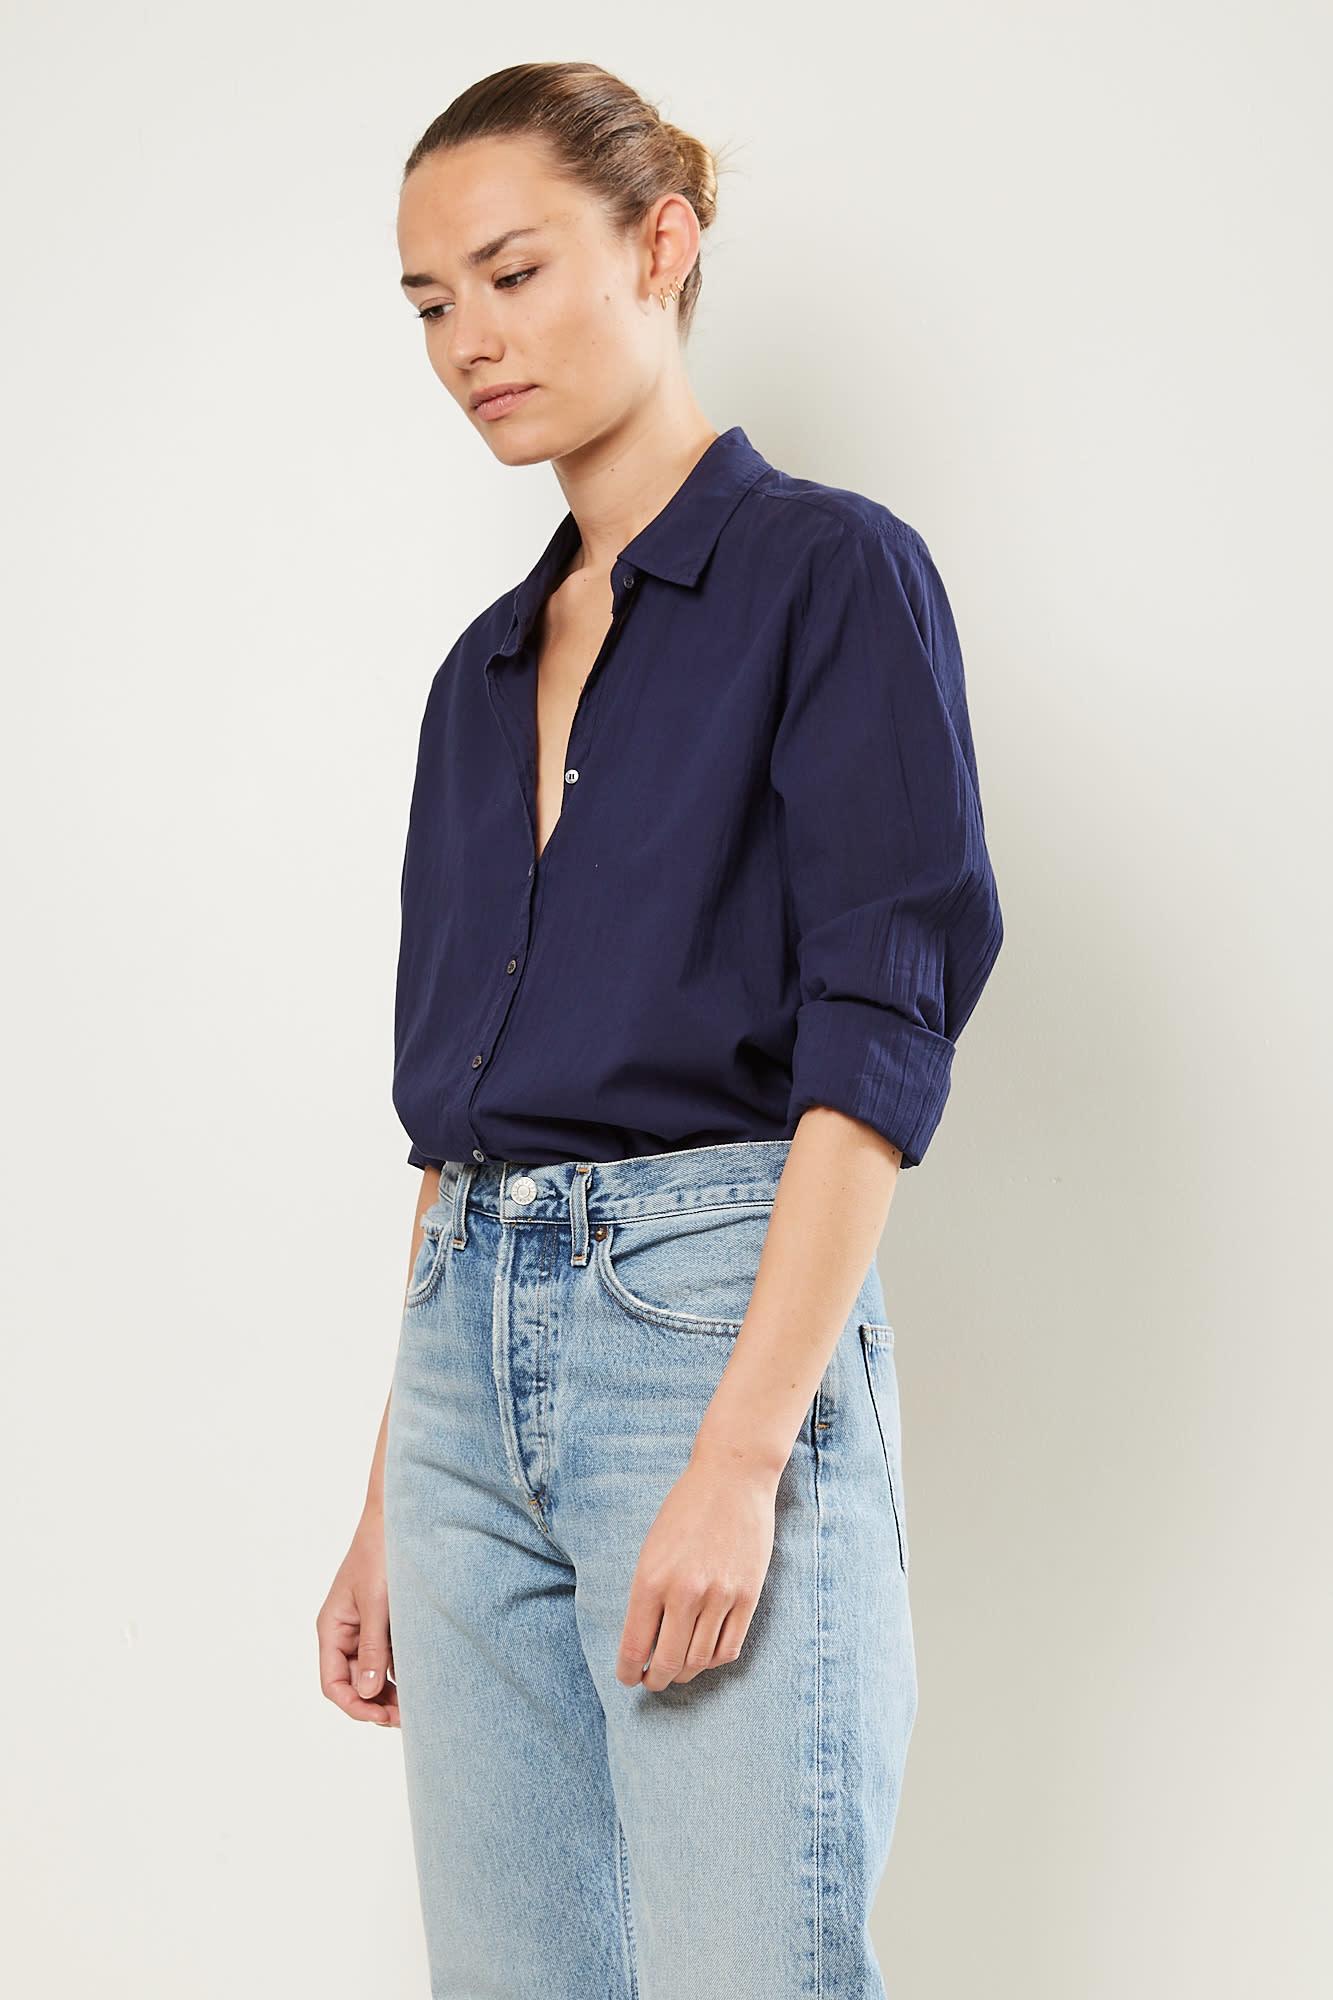 Xirena - Beau cotton poplin shirt marine blue